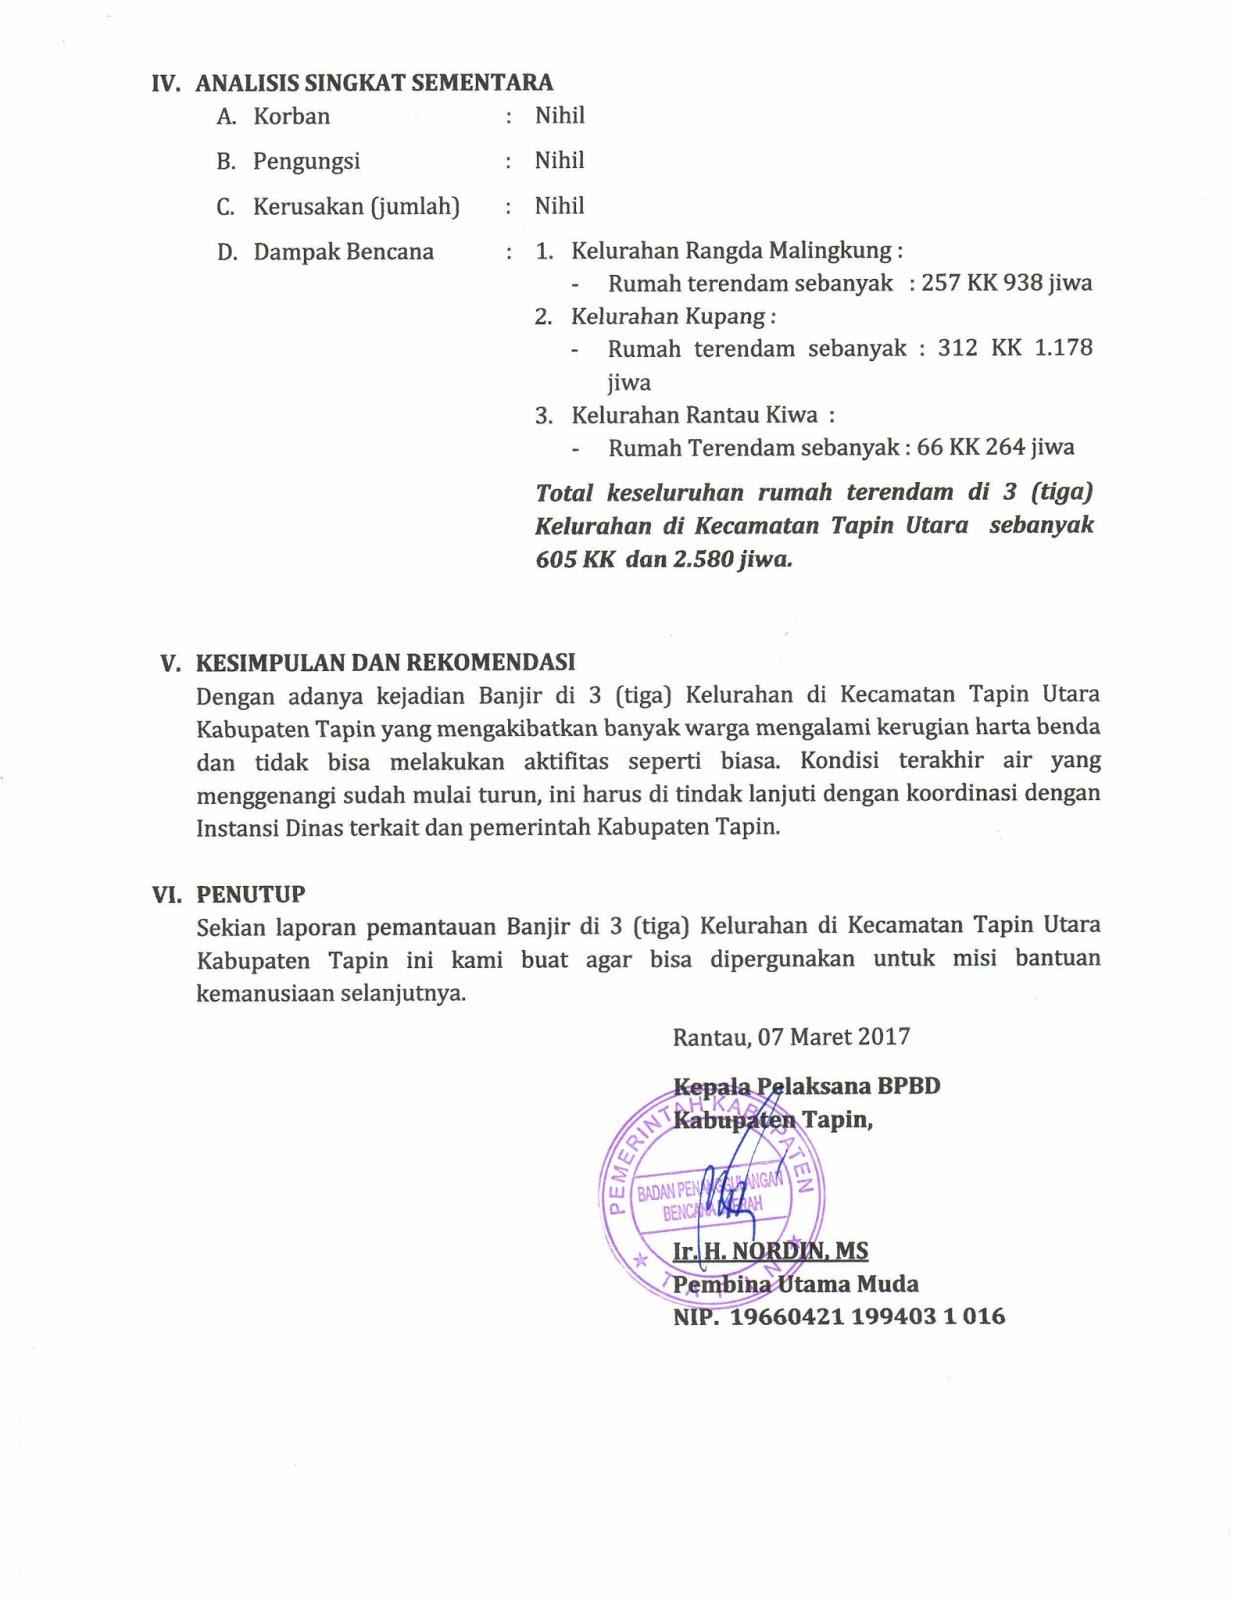 Laporan Banjir 3 Tiga Kelurahan Website Resmi Bpbd Kabupaten Tapin